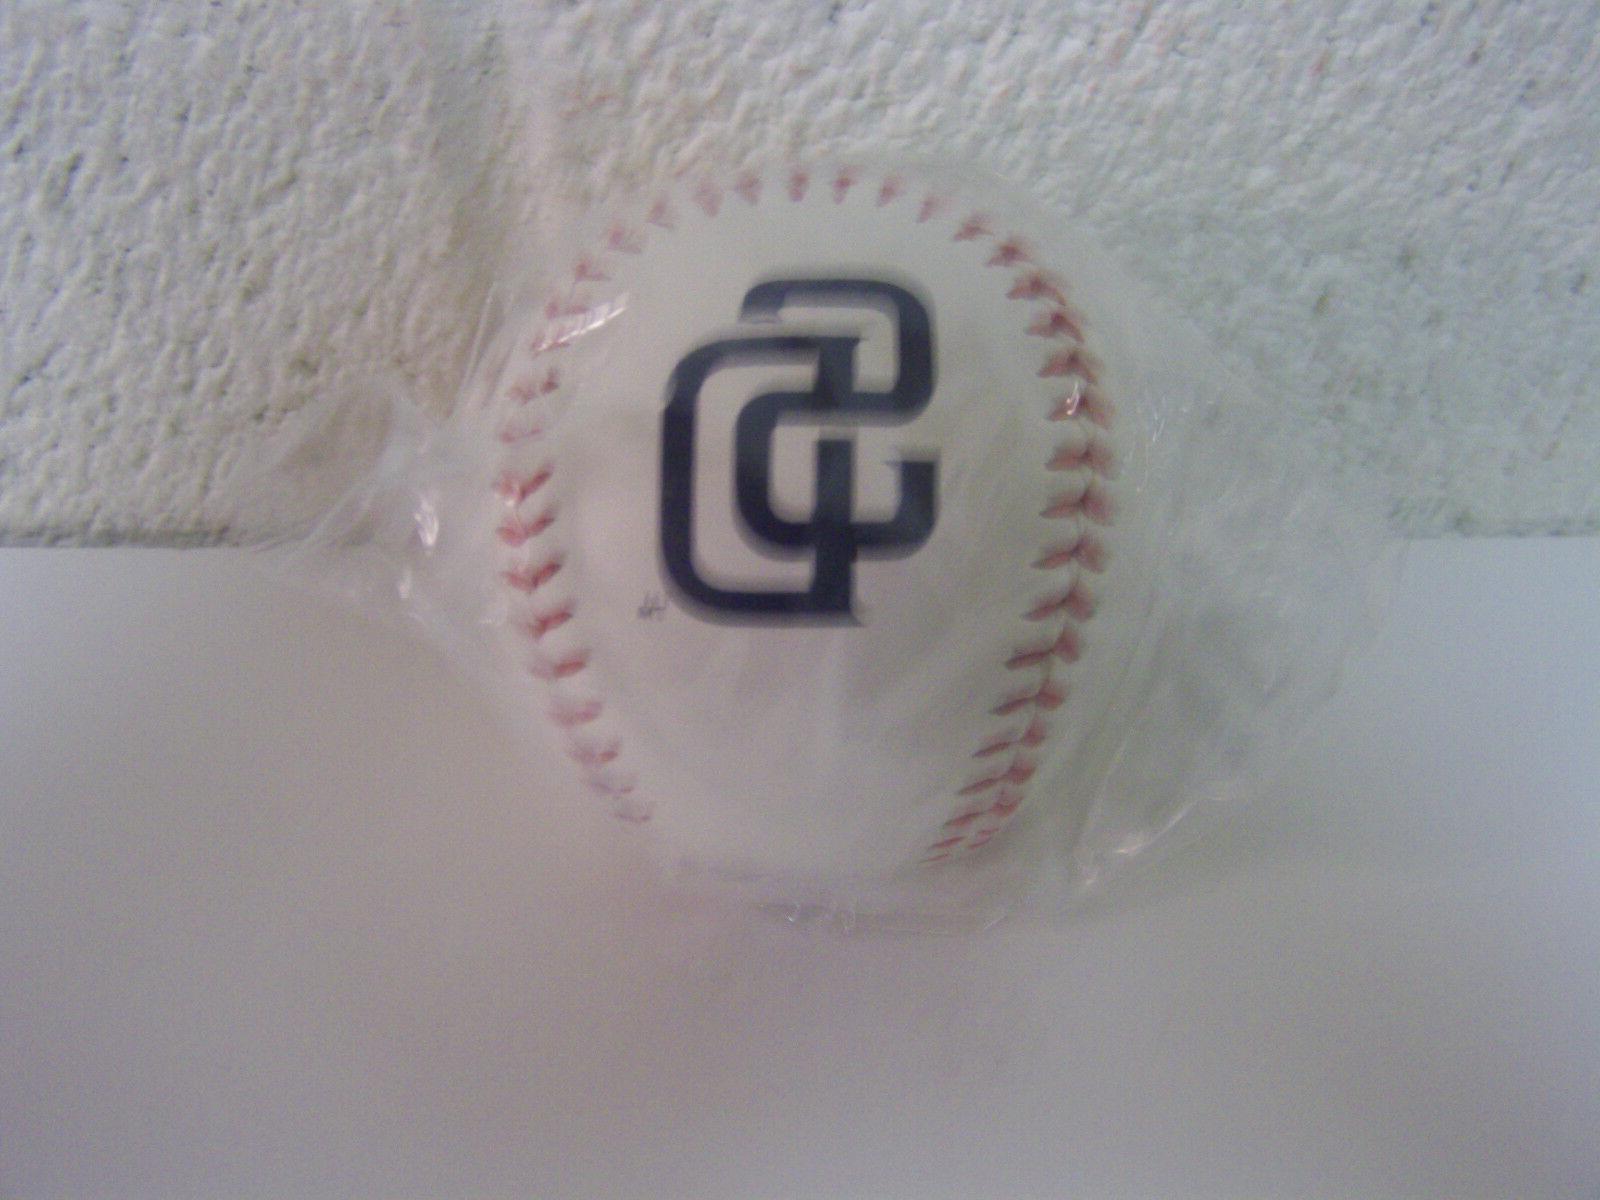 1 san diego padres team logo ball